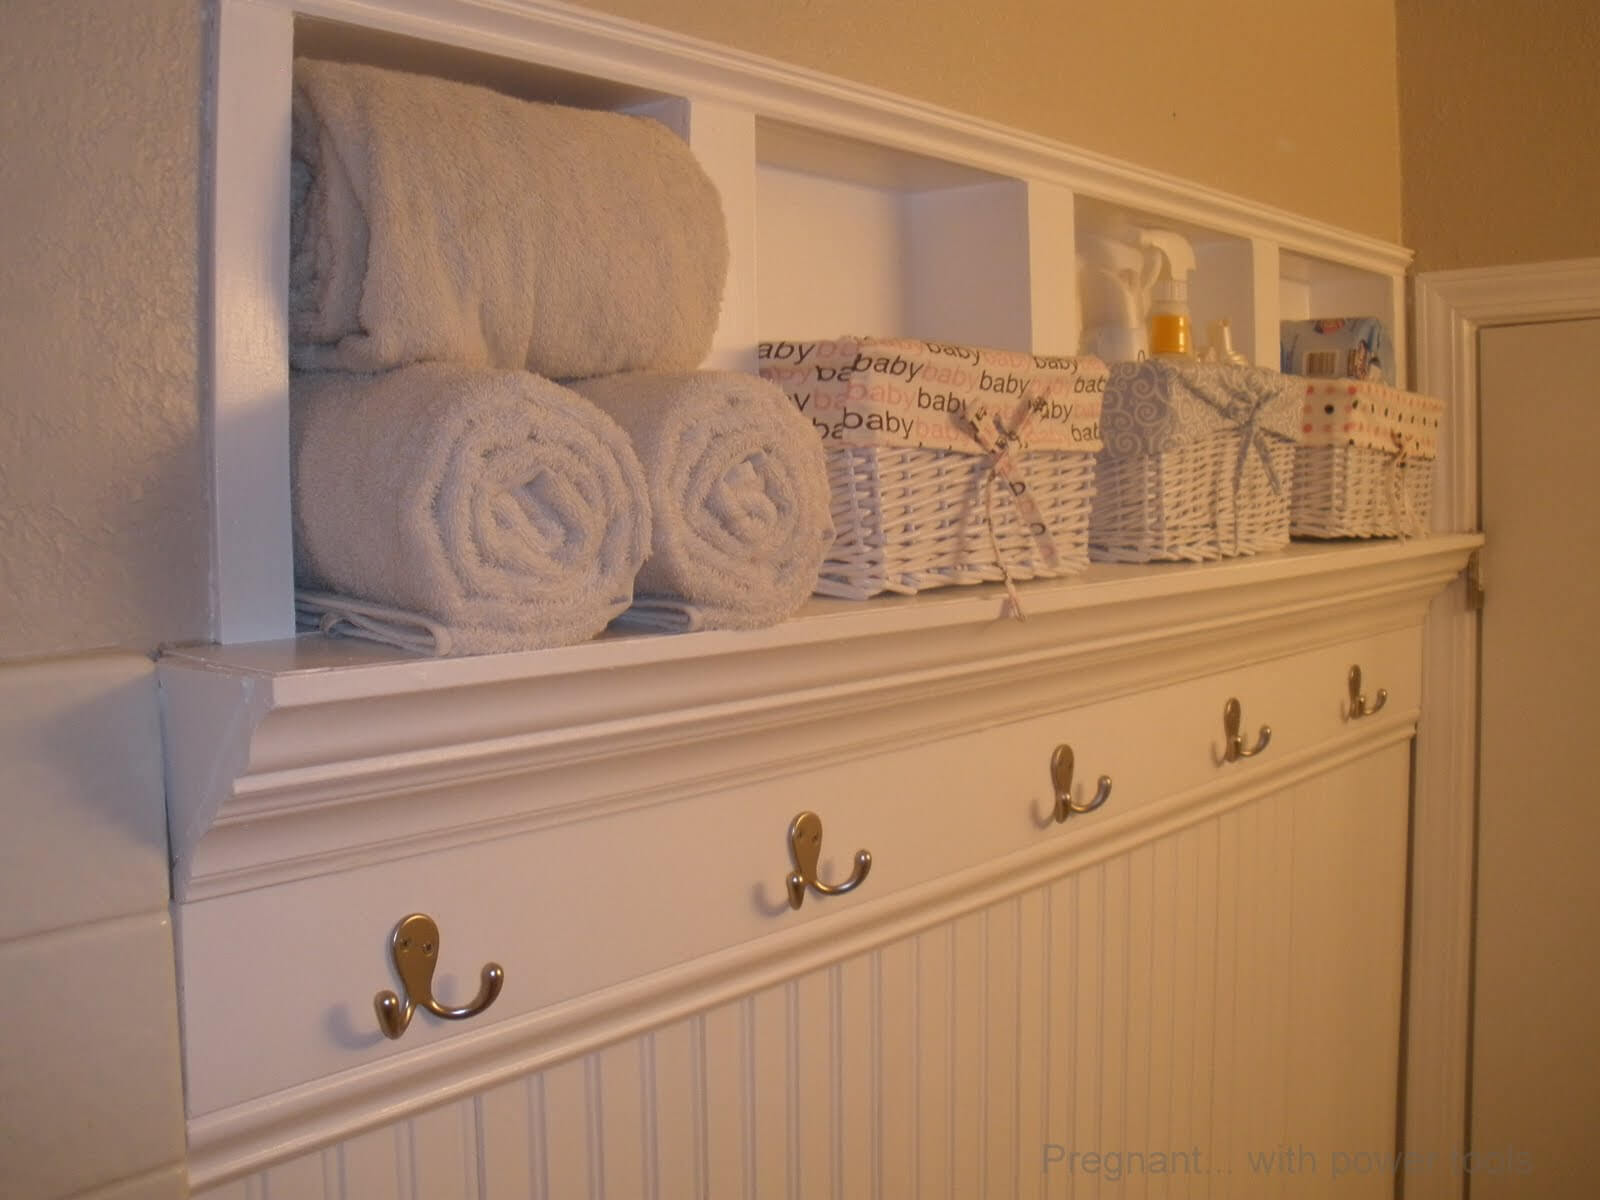 23-small-bathroom-storage-ideas-homebnc